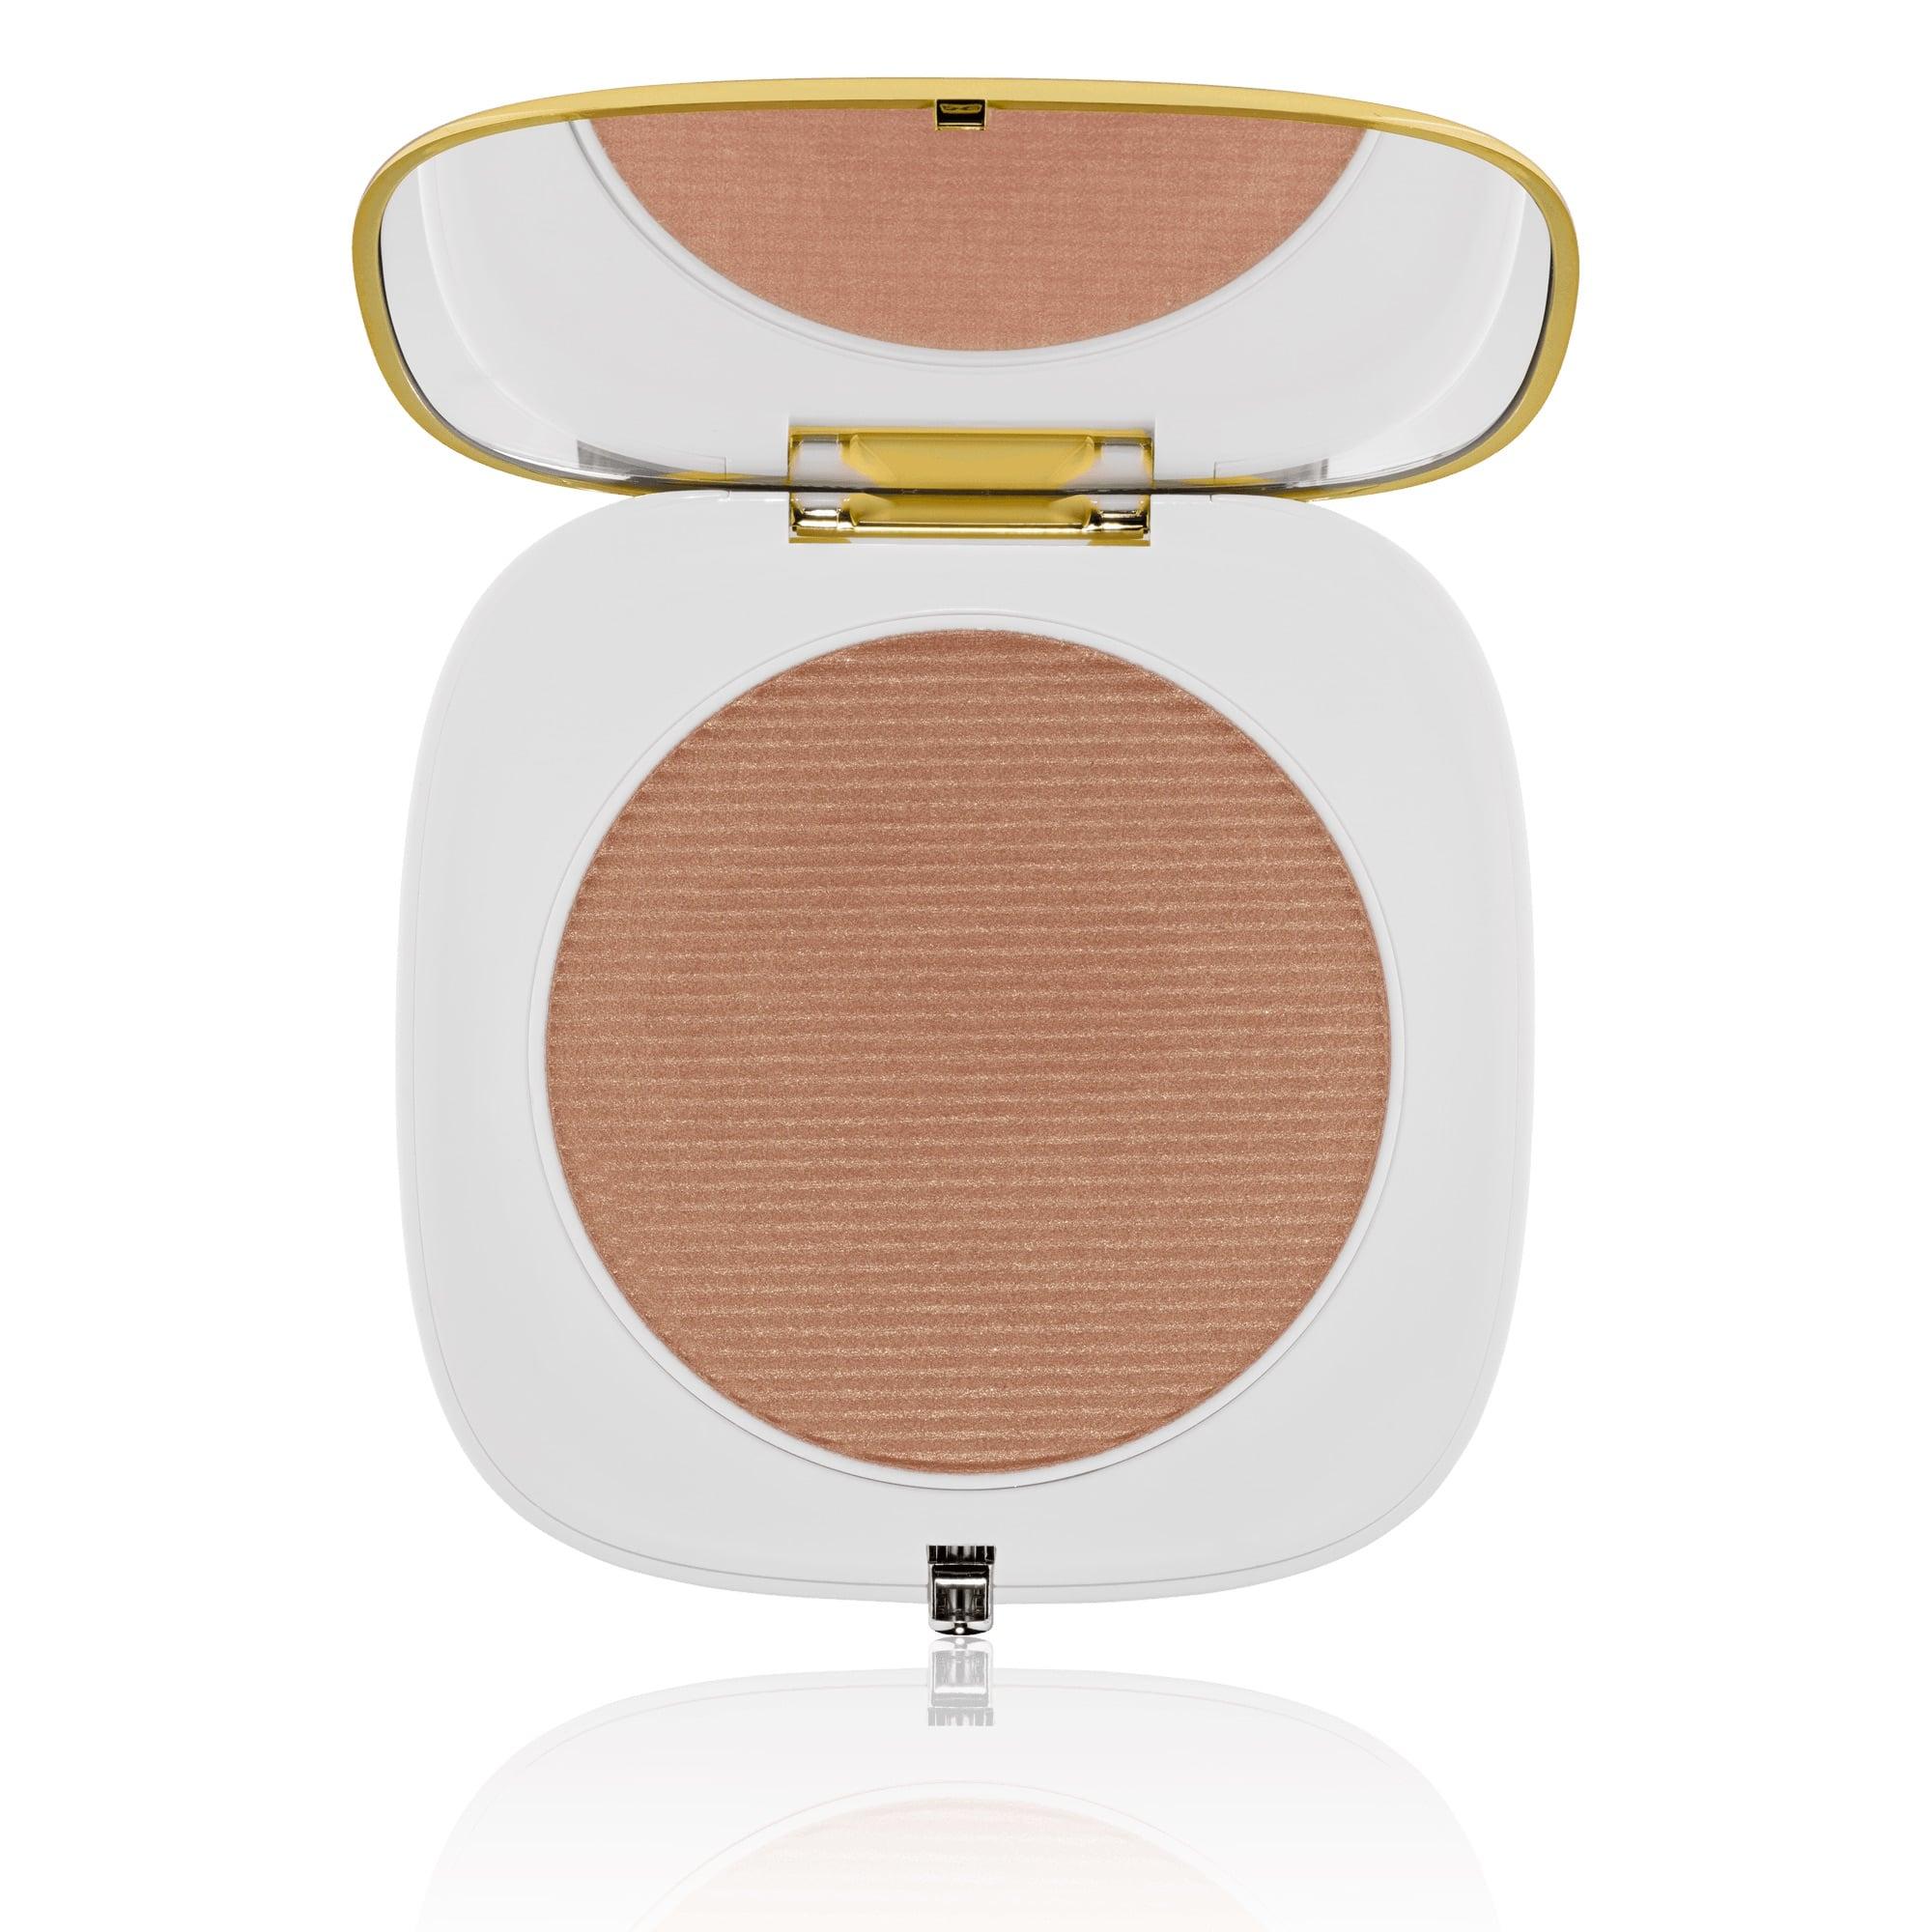 Marc Jacobs Beauty O!Mega Glaze All-Over Foil Luminizer